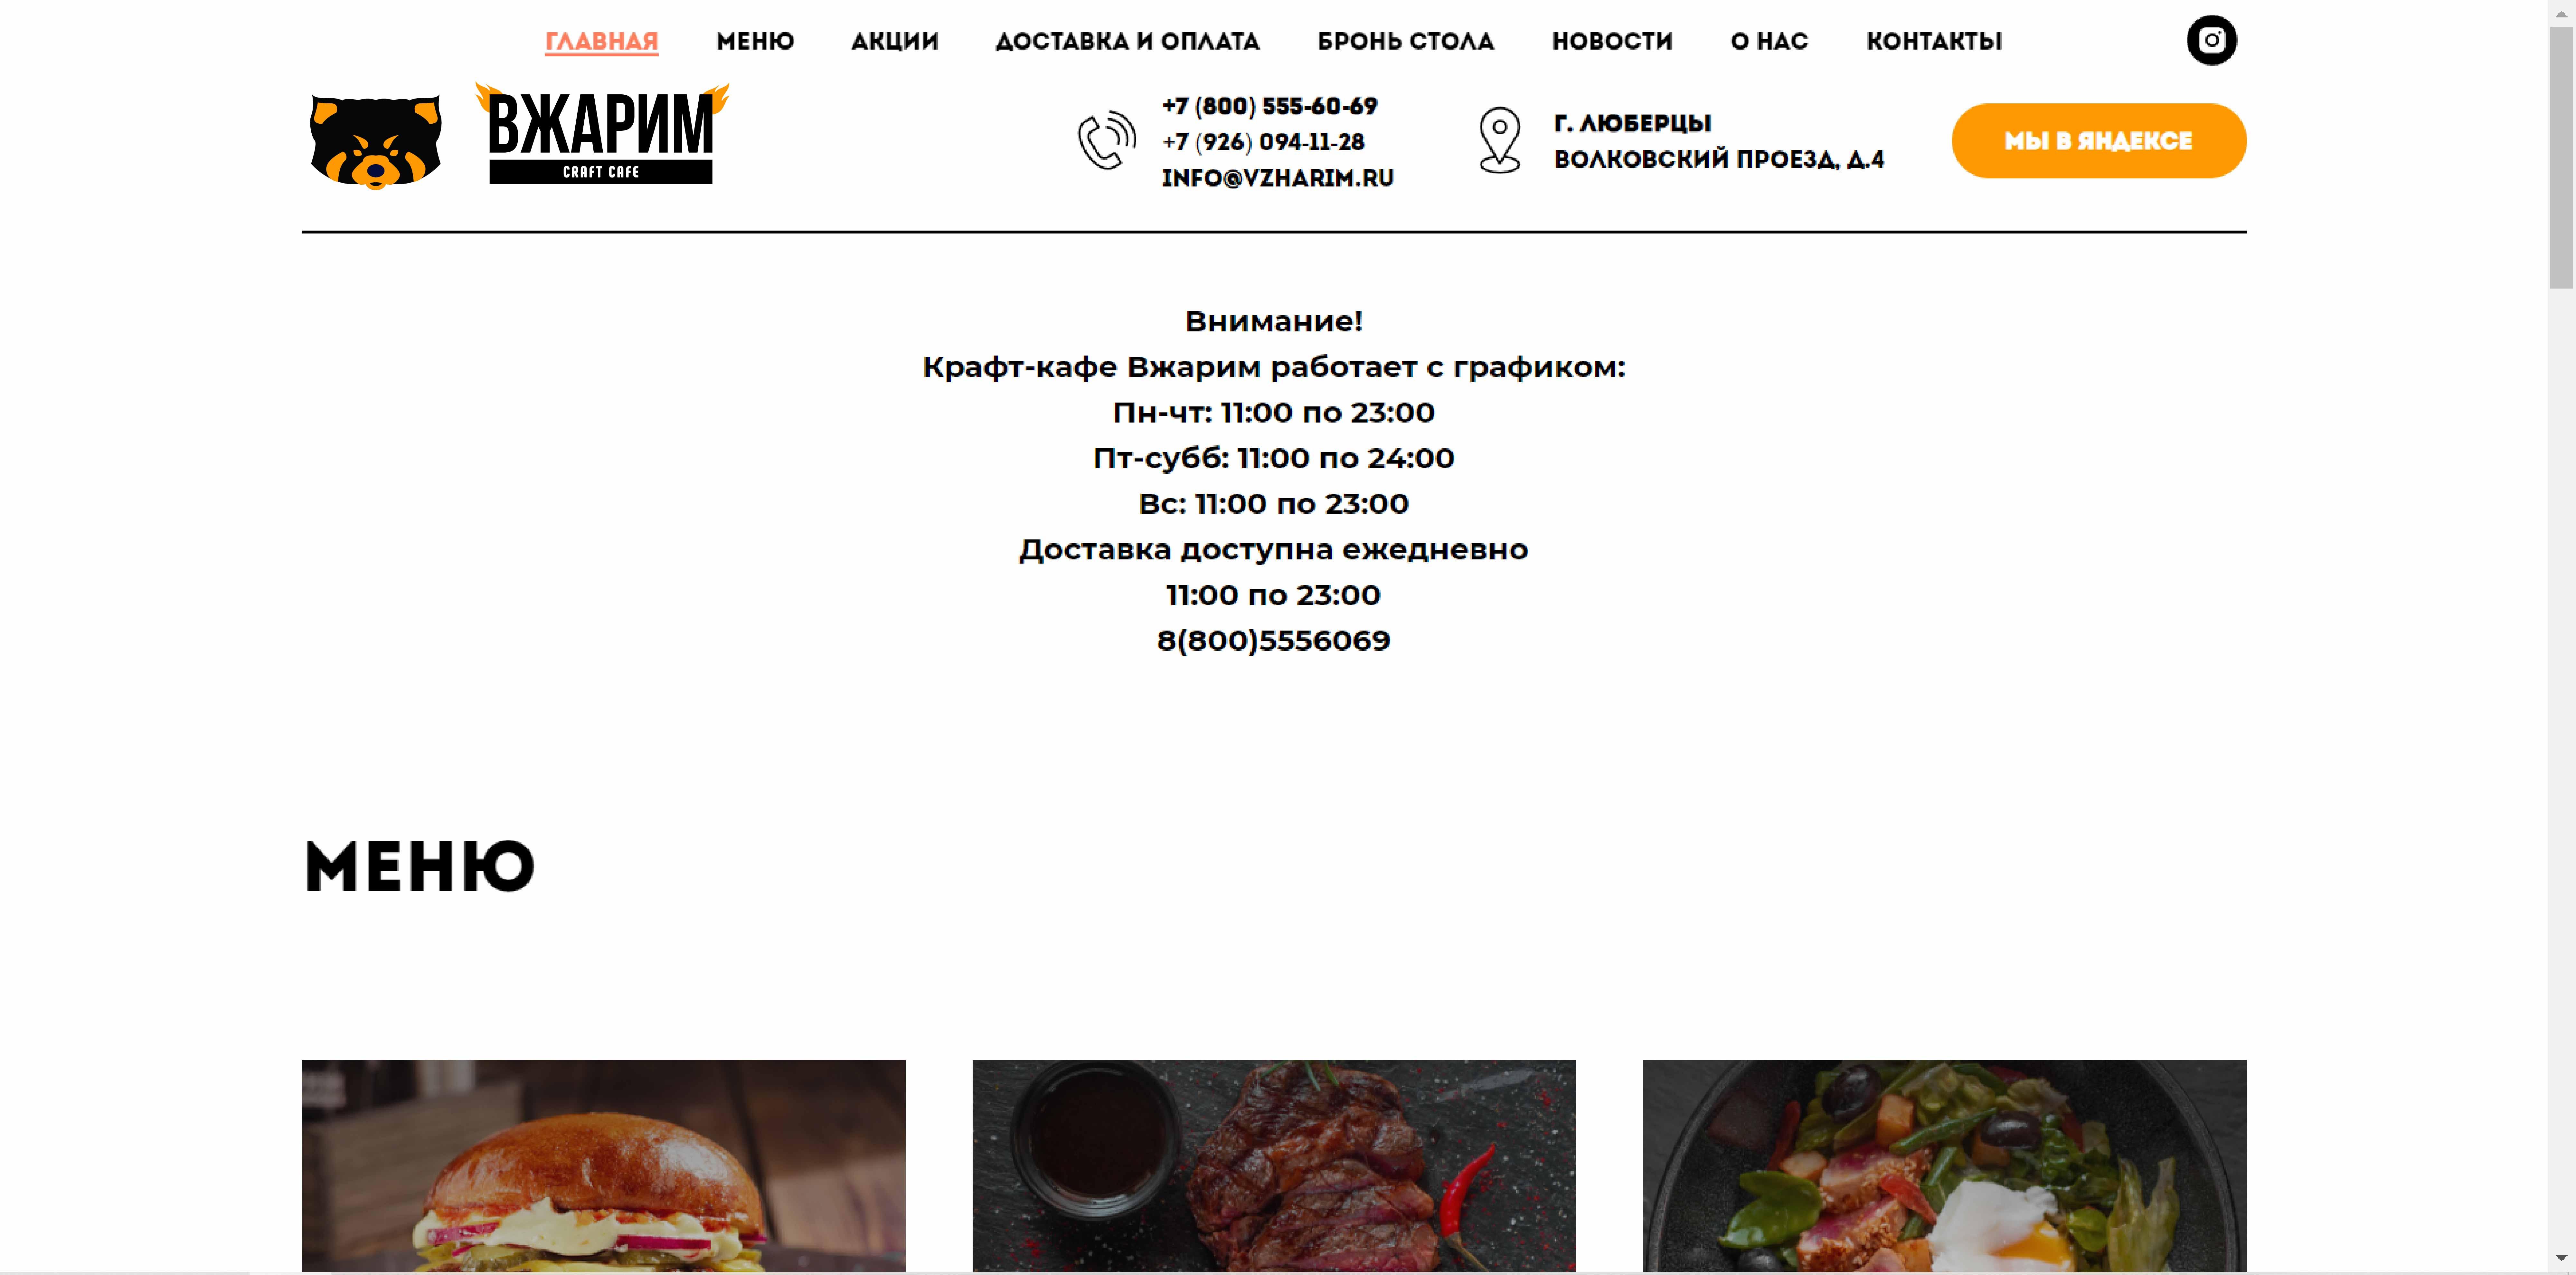 Требуется, разработка логотипа для крафт-кафе «ВЖАРИМ». фото f_815601a087871590.jpg